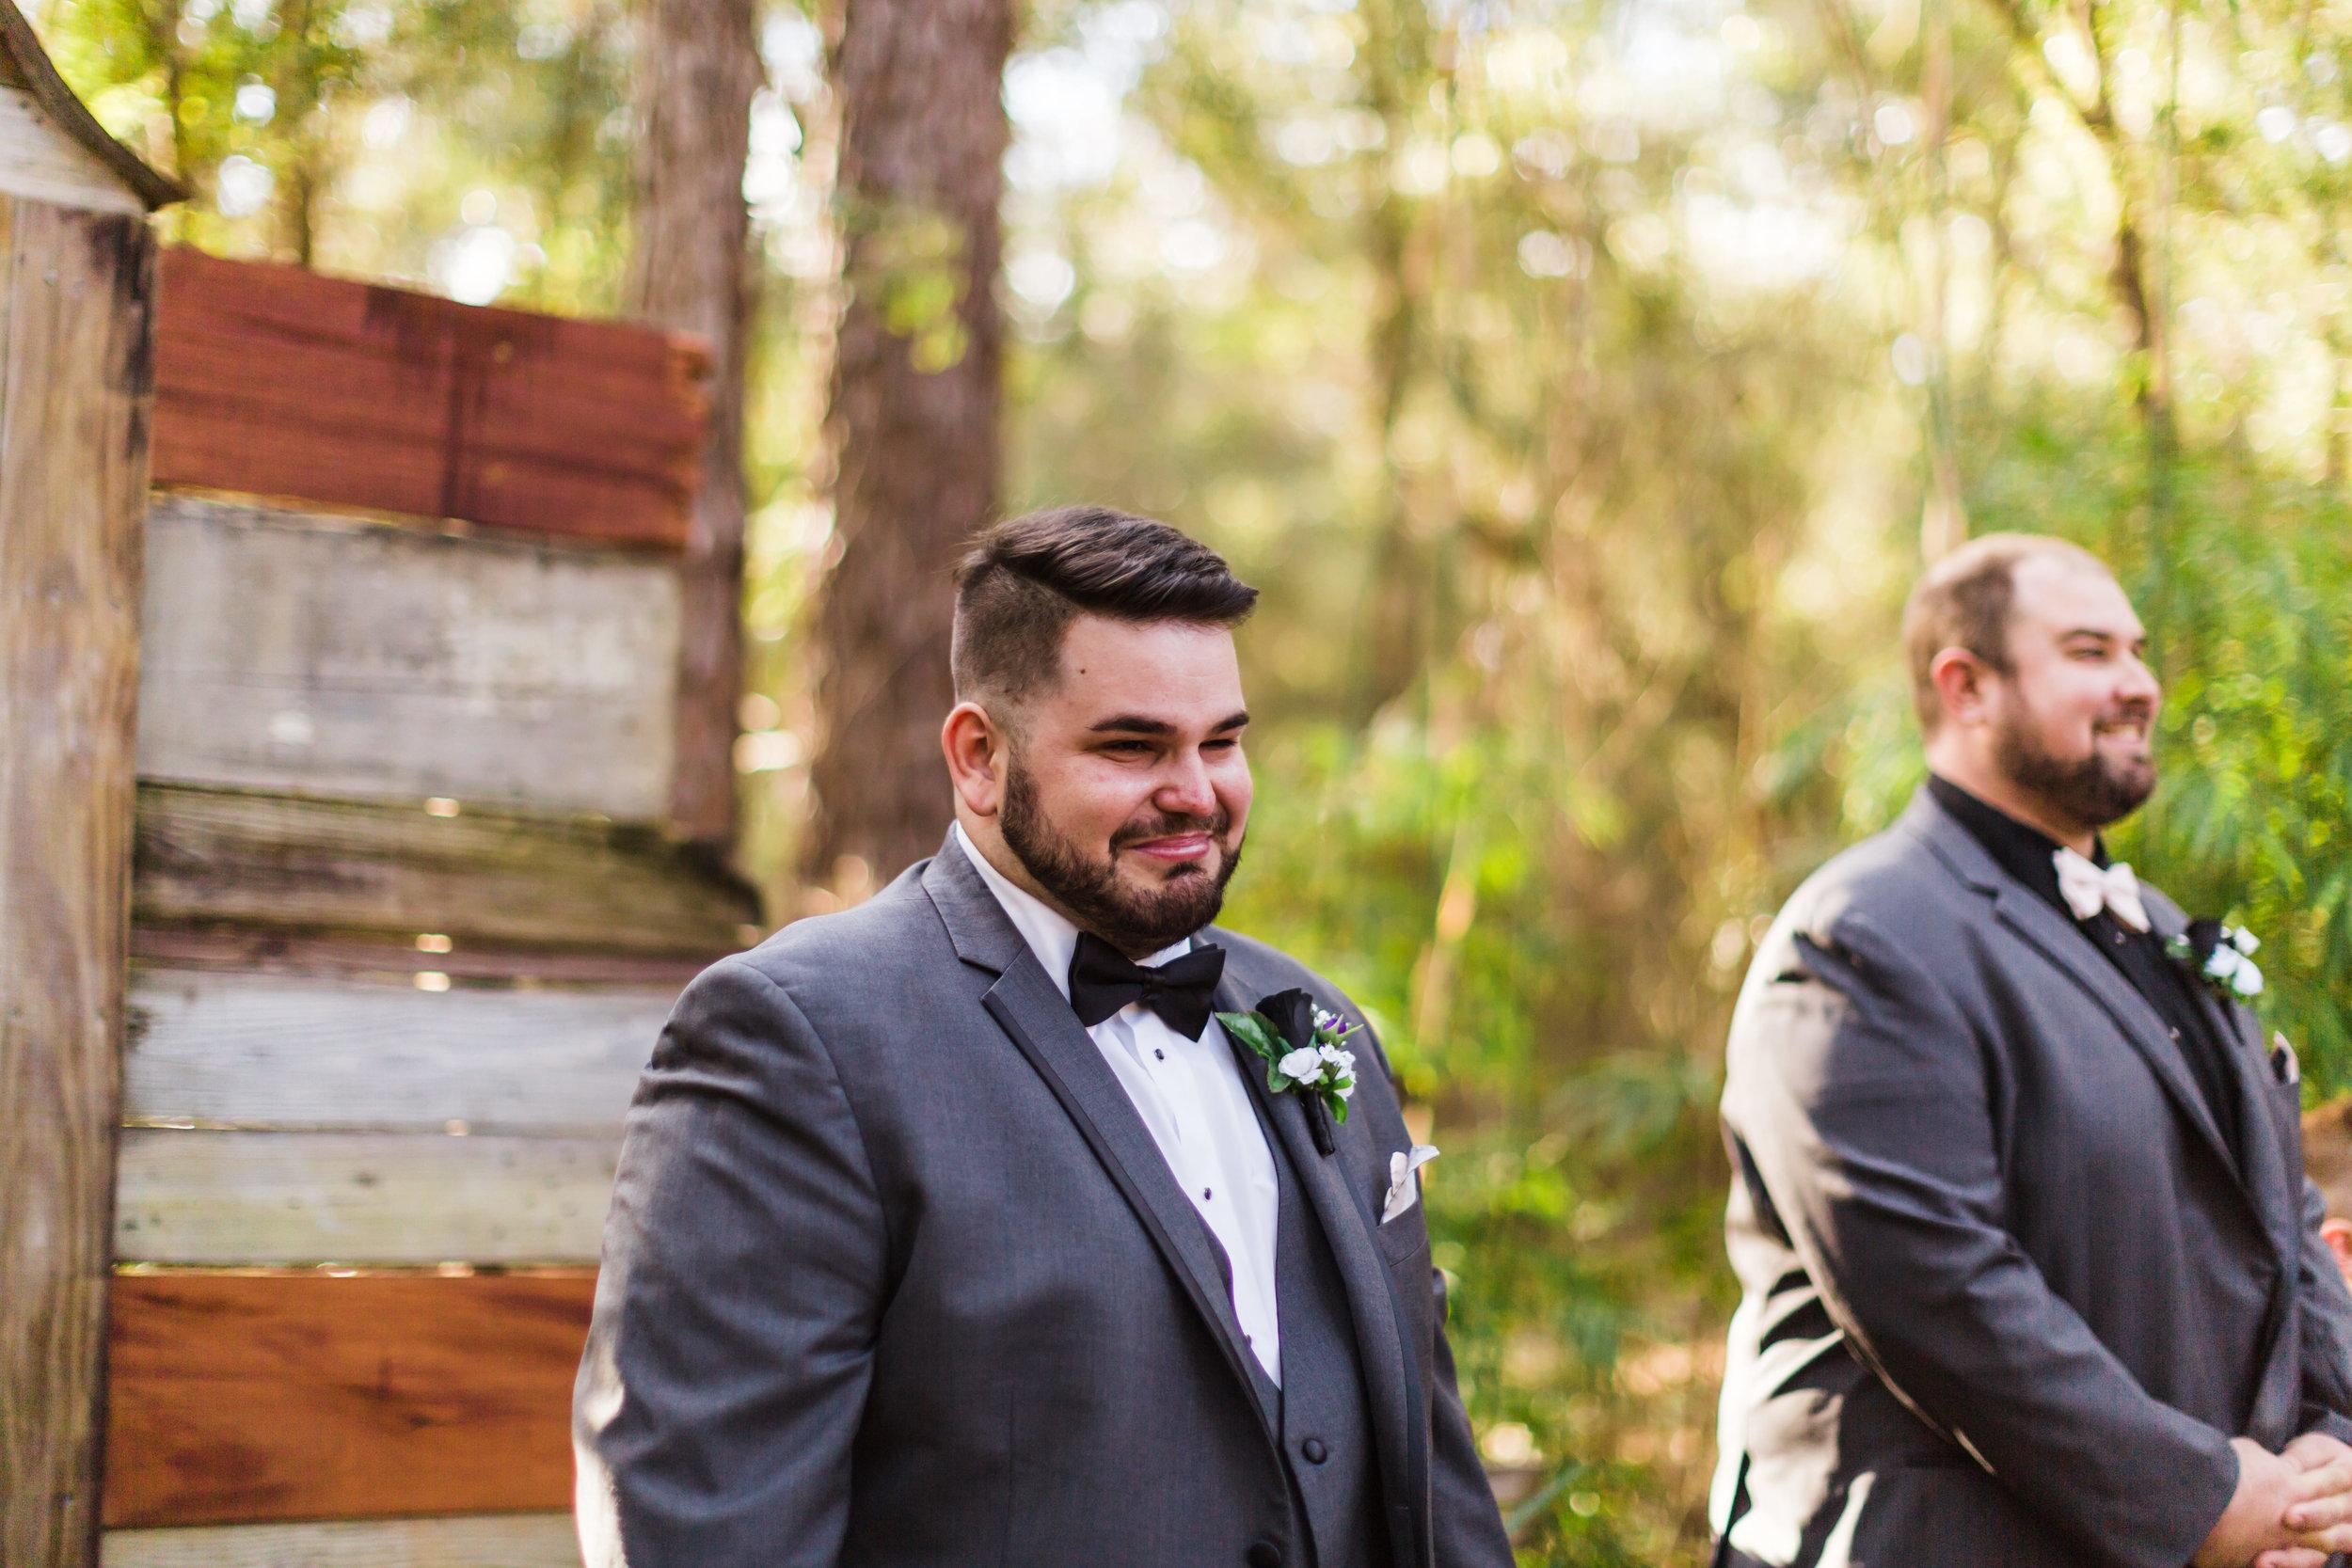 2019.01.12 Ashley and Nathan Bridle Oaks Wedding (248 of 1091).jpg